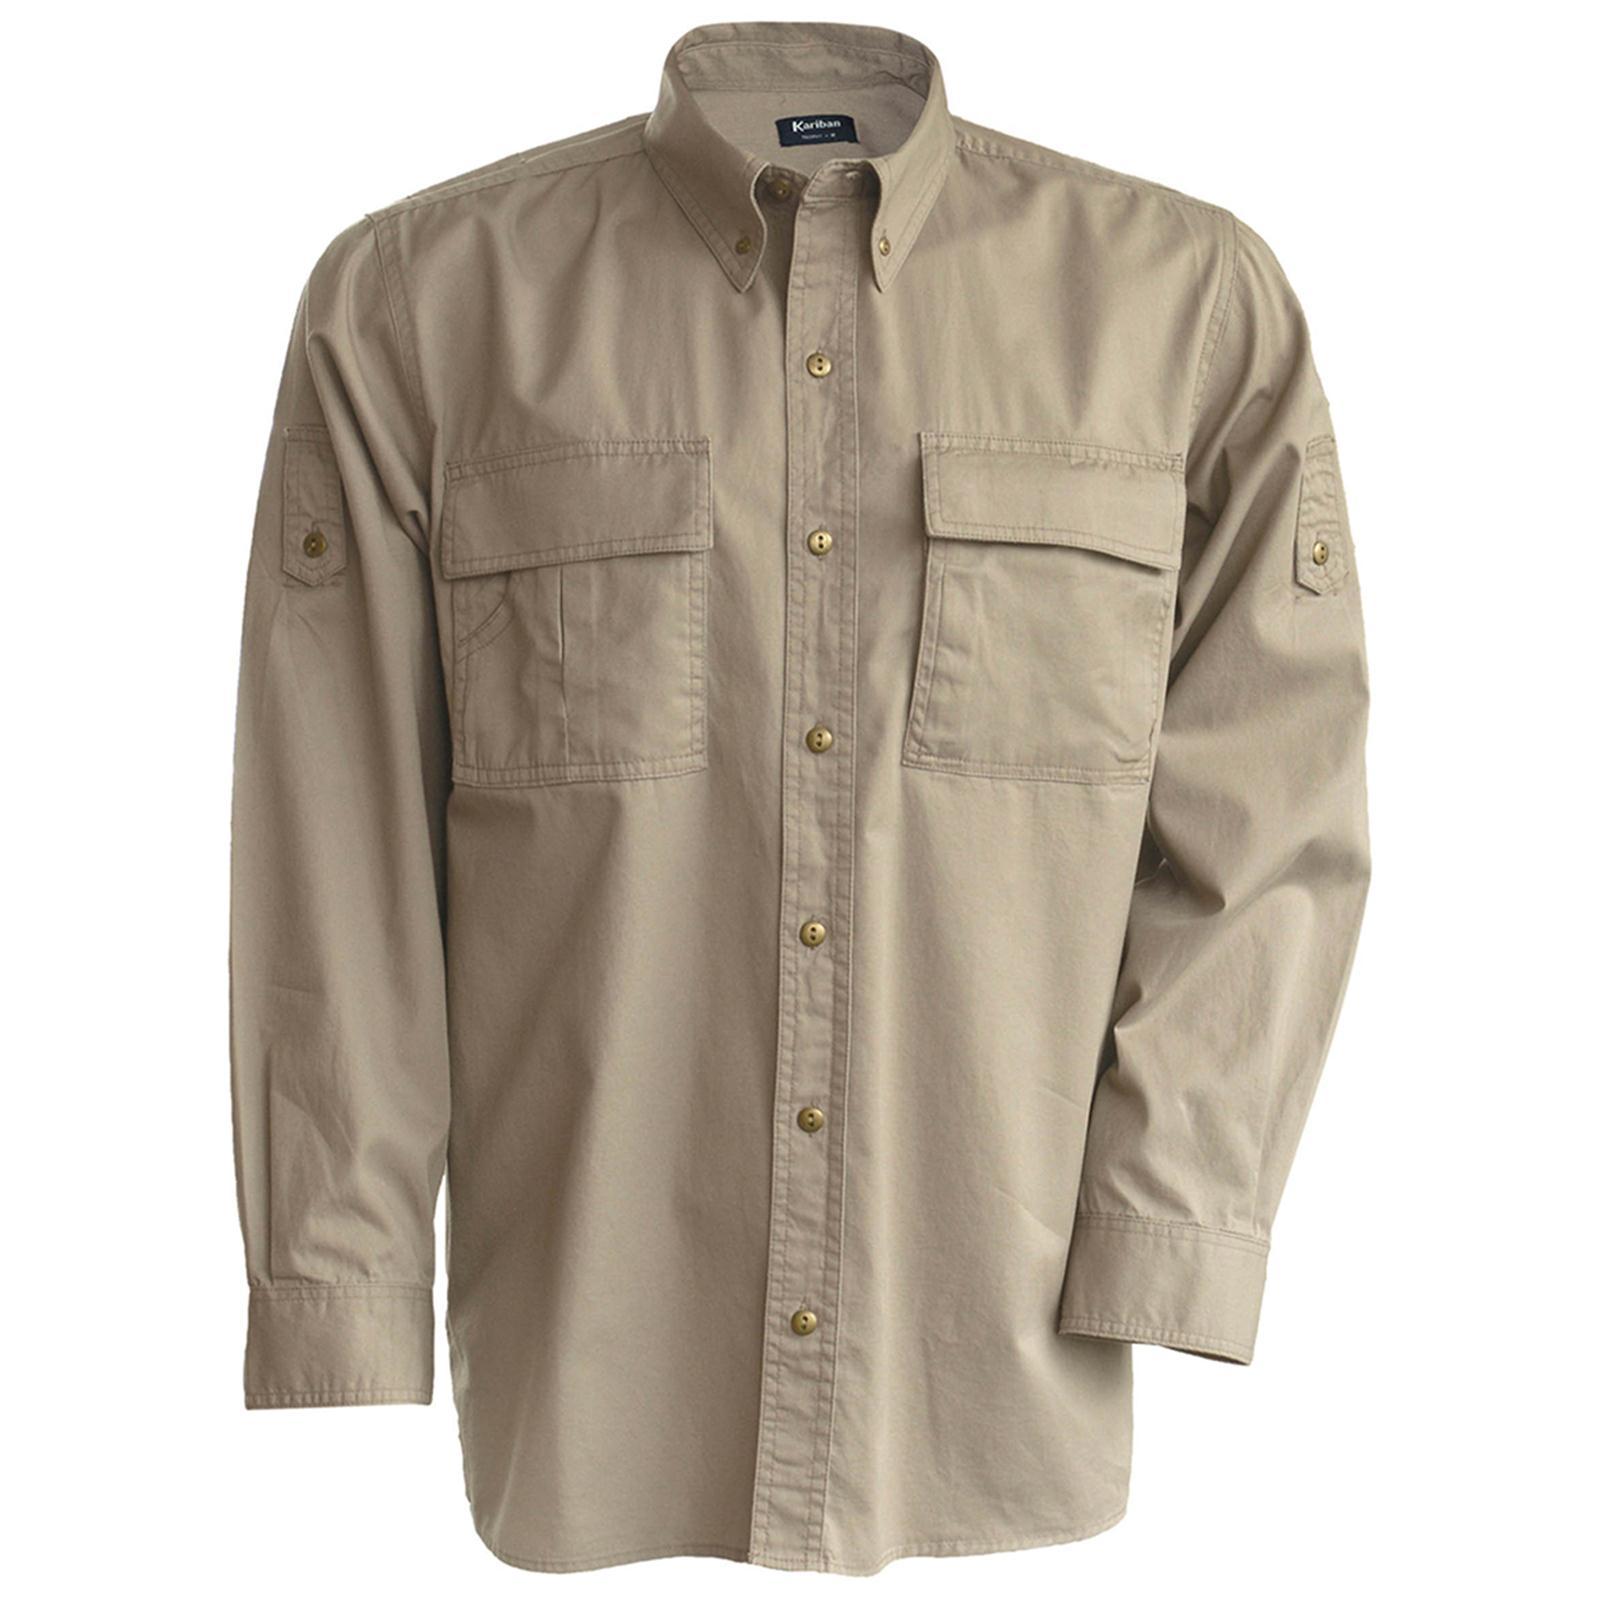 New-KARIBAN-Trophy-Safari-Shirt-in-Beige-M-2XL